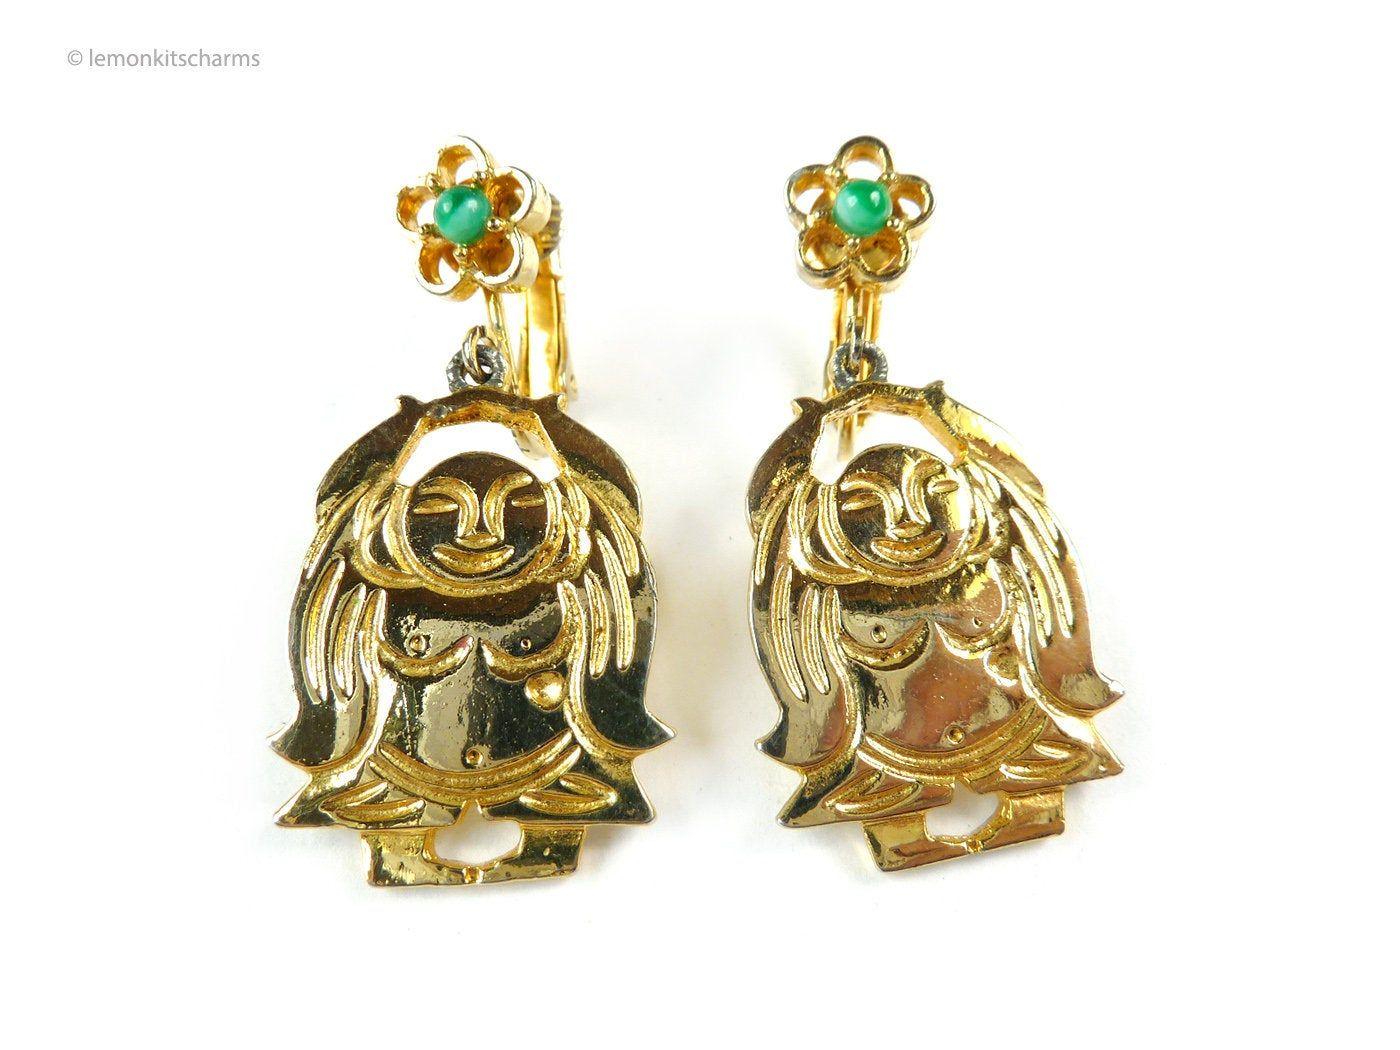 Vintage 1960s to 1970s Copper Screw Back Earrings Non Pierced Dangle Butterflies Retro Mid Century